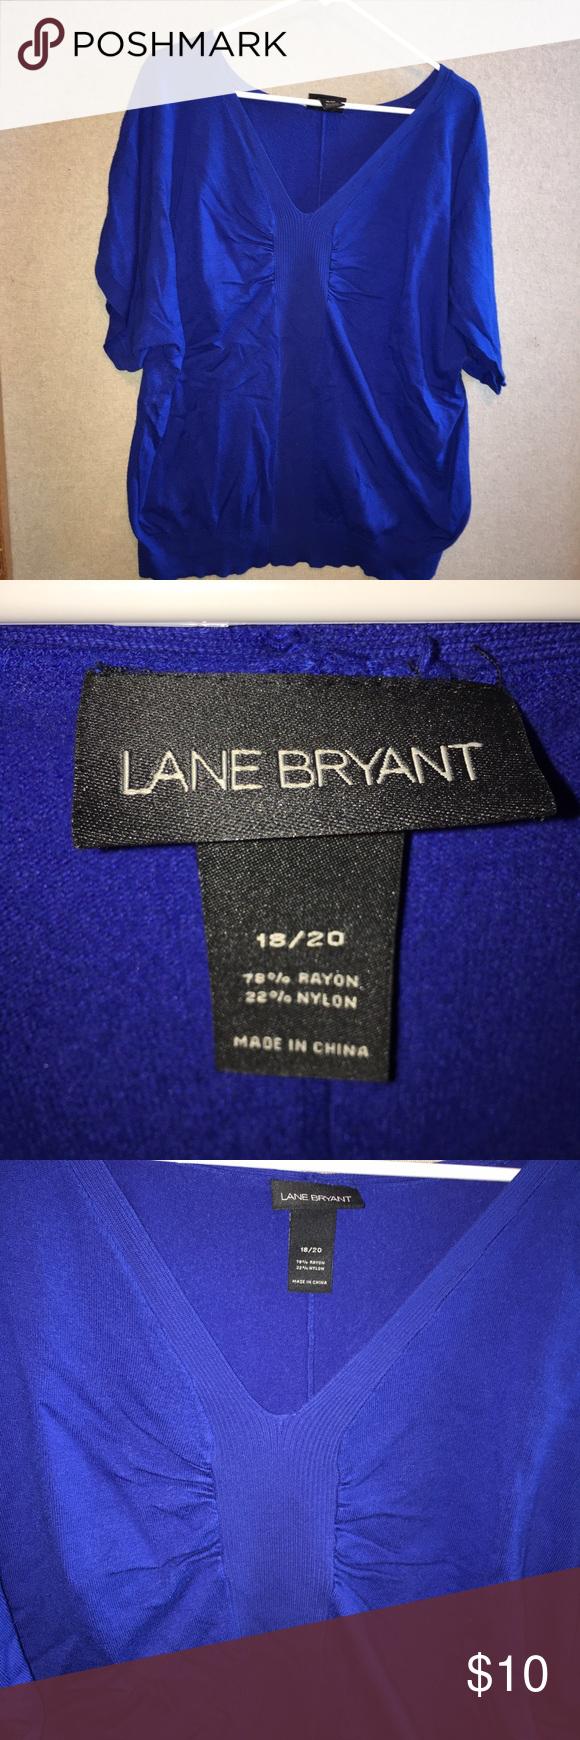 LANE BRYANT royal blue sweater Royal blue v neck sweater Lane Bryant Sweaters Crew & Scoop Necks